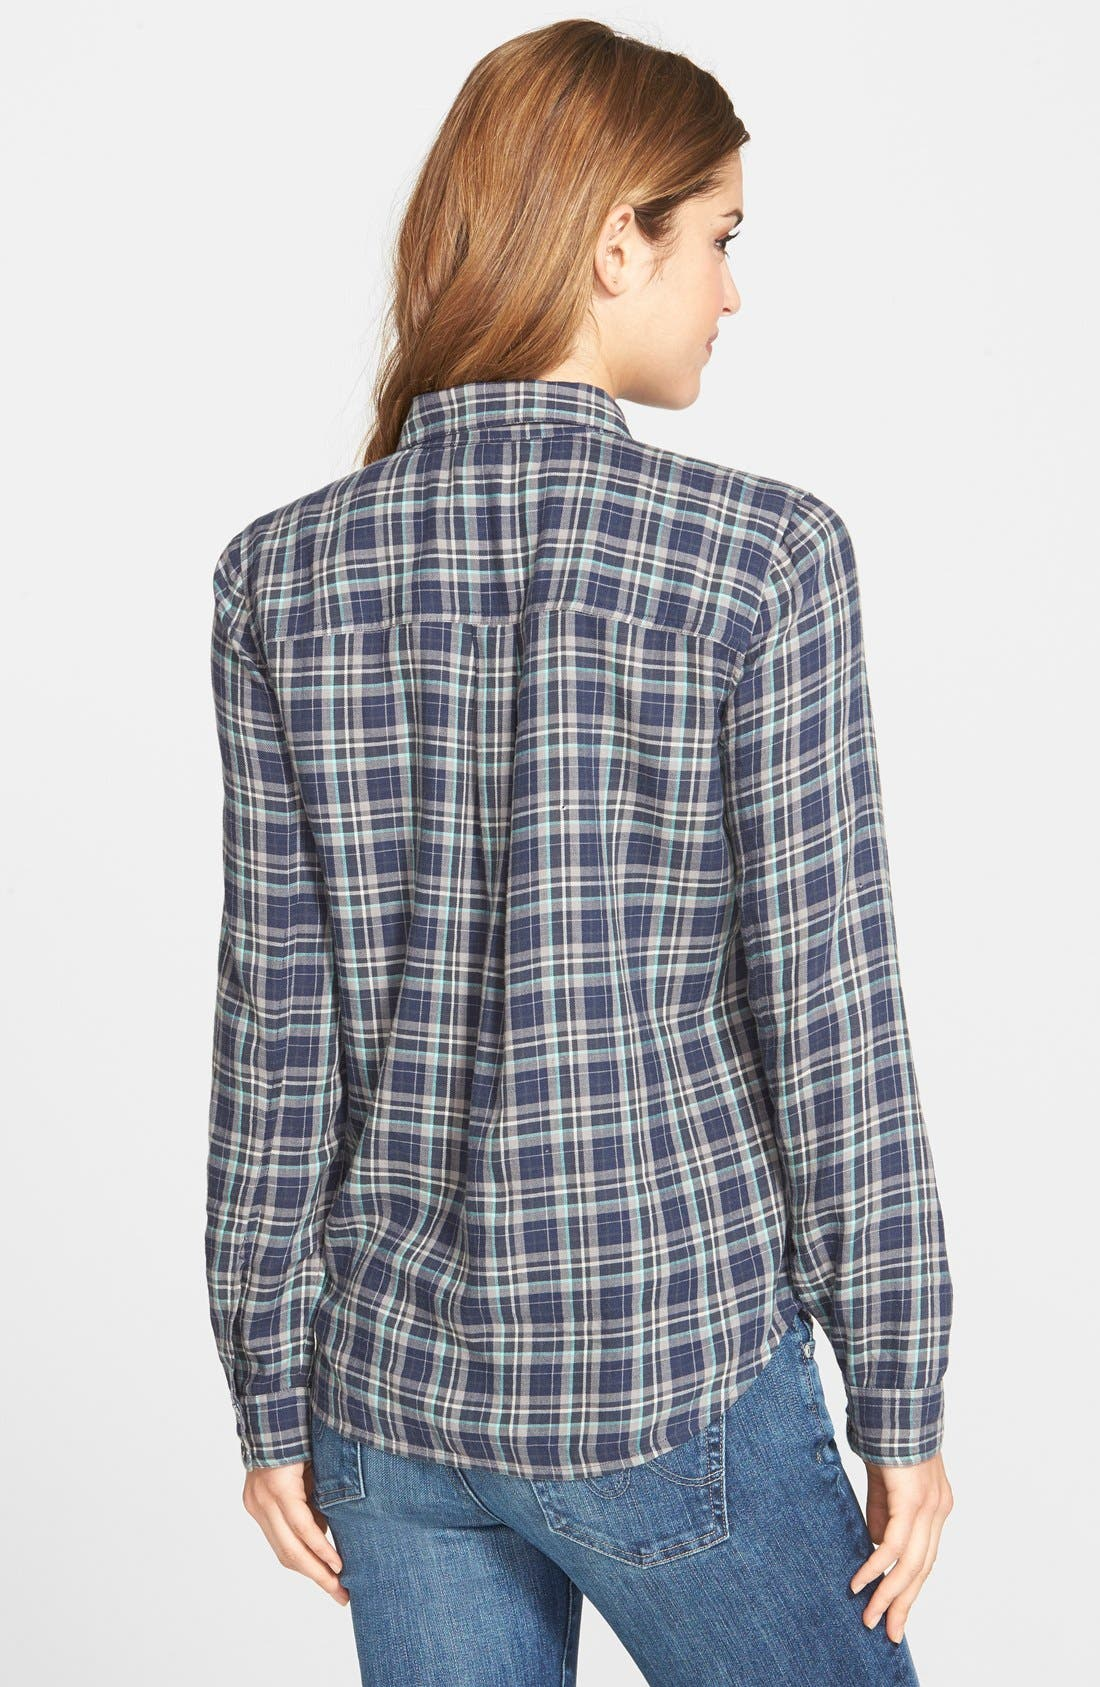 Embellished Plaid Shirt,                             Alternate thumbnail 2, color,                             410